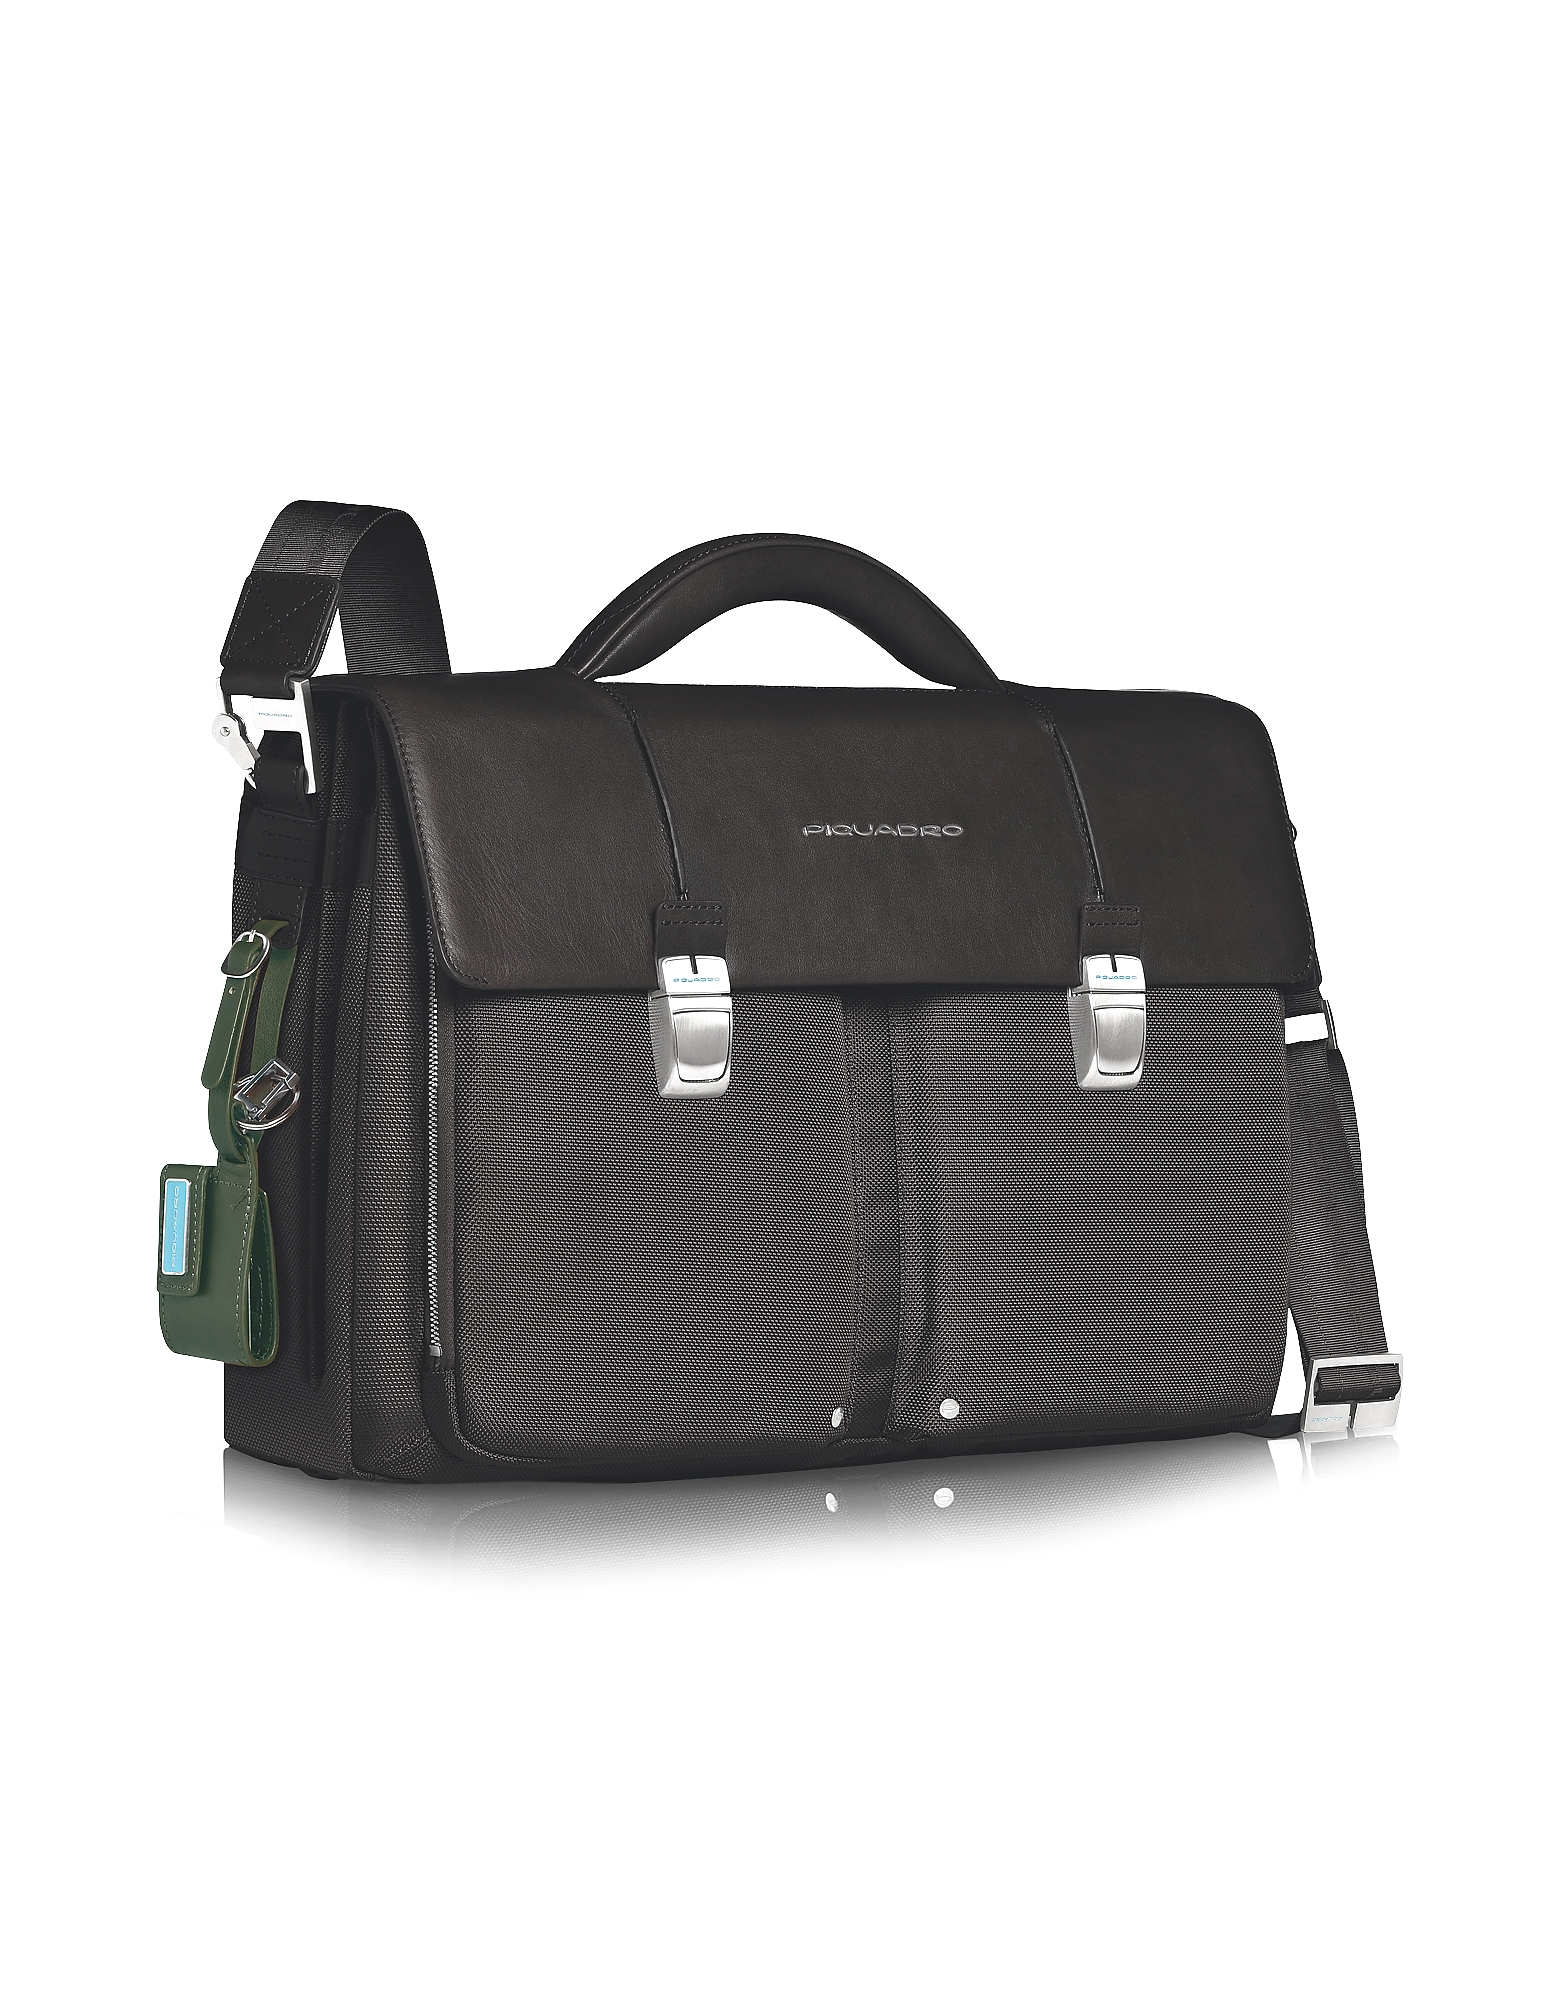 "Piquadro Designer Briefcases,  Link - Double Front Pocket Double Gusset 15"" Laptop Briefcase"